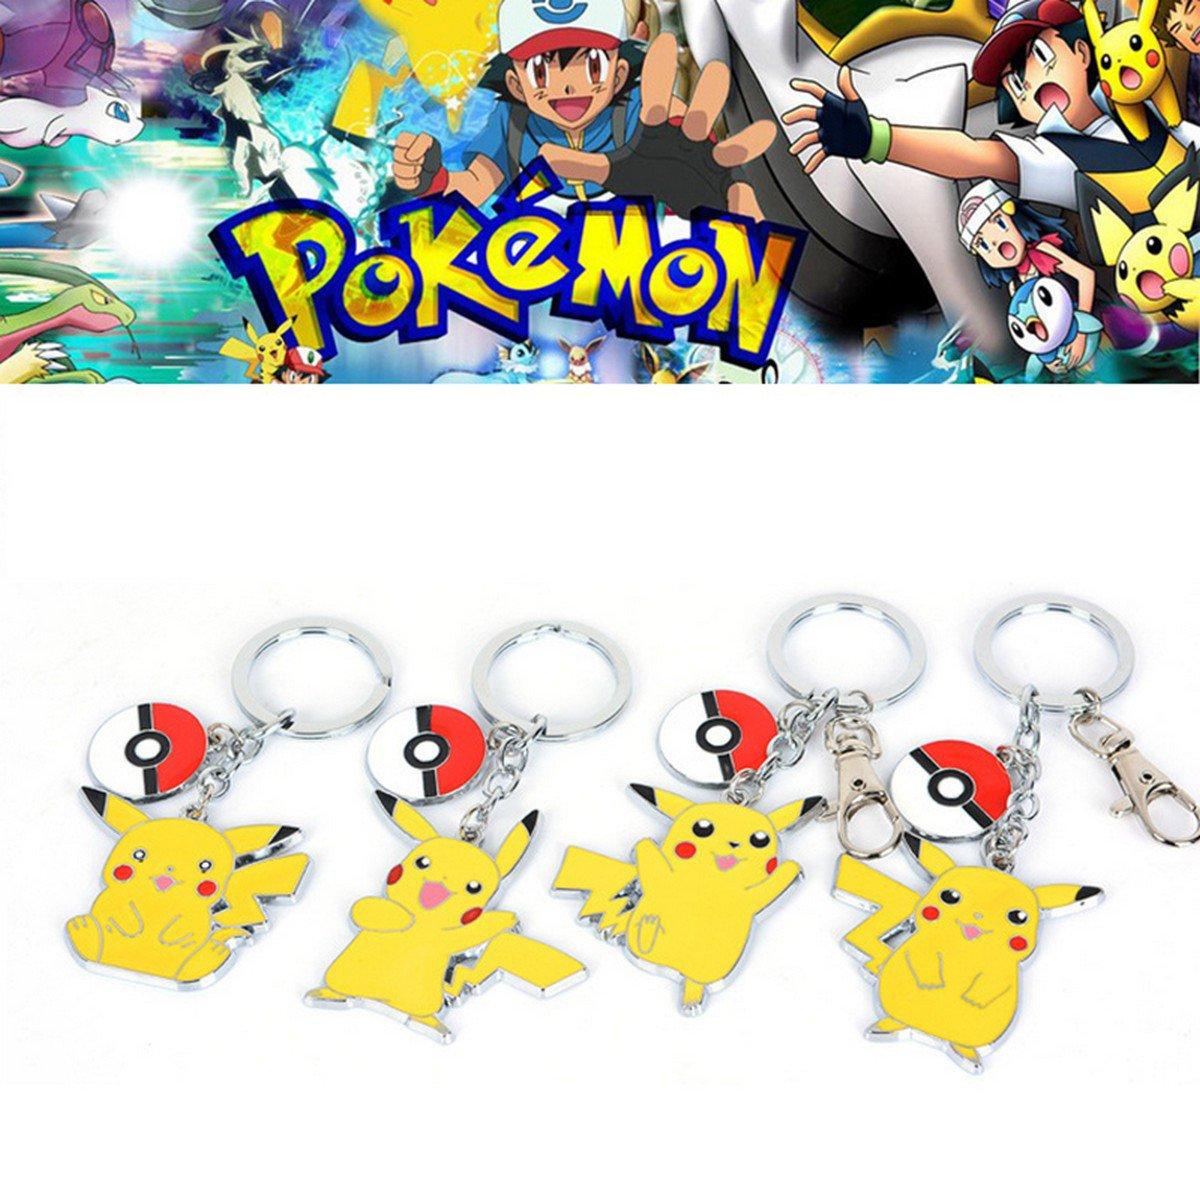 Buy 2016 New 20cm Pokemon Ditto with Pikachu Hat  Plush Toys Fashion Cartoon Plush Toys Movies  TV